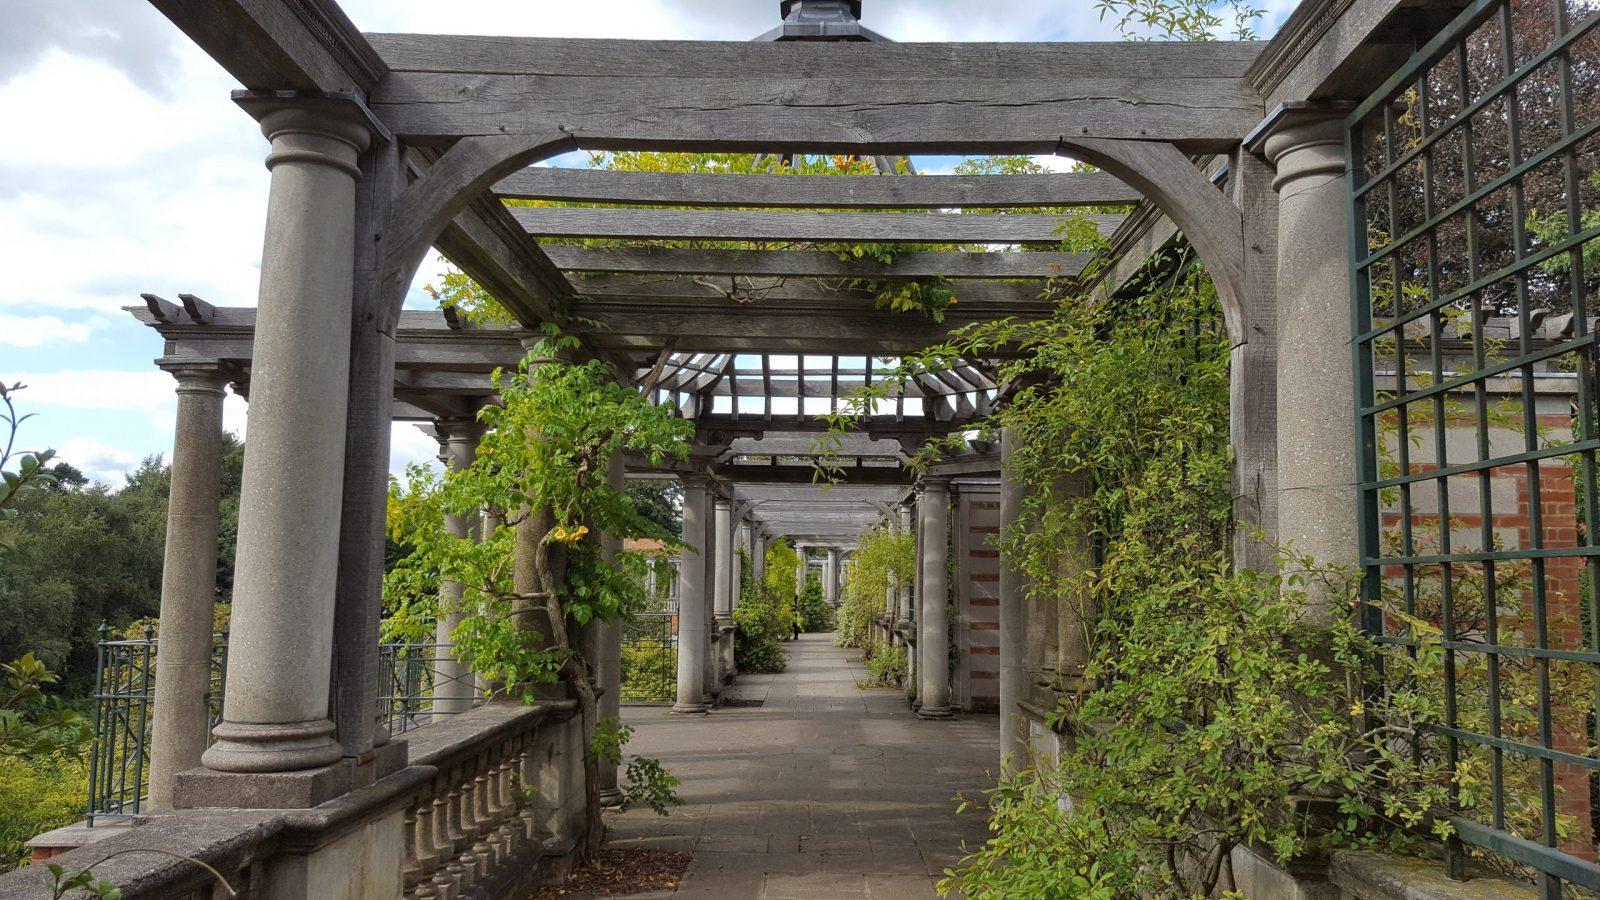 Visiting Hill Garden & Pergola, Hampstead Heath: Photo Gallery 13